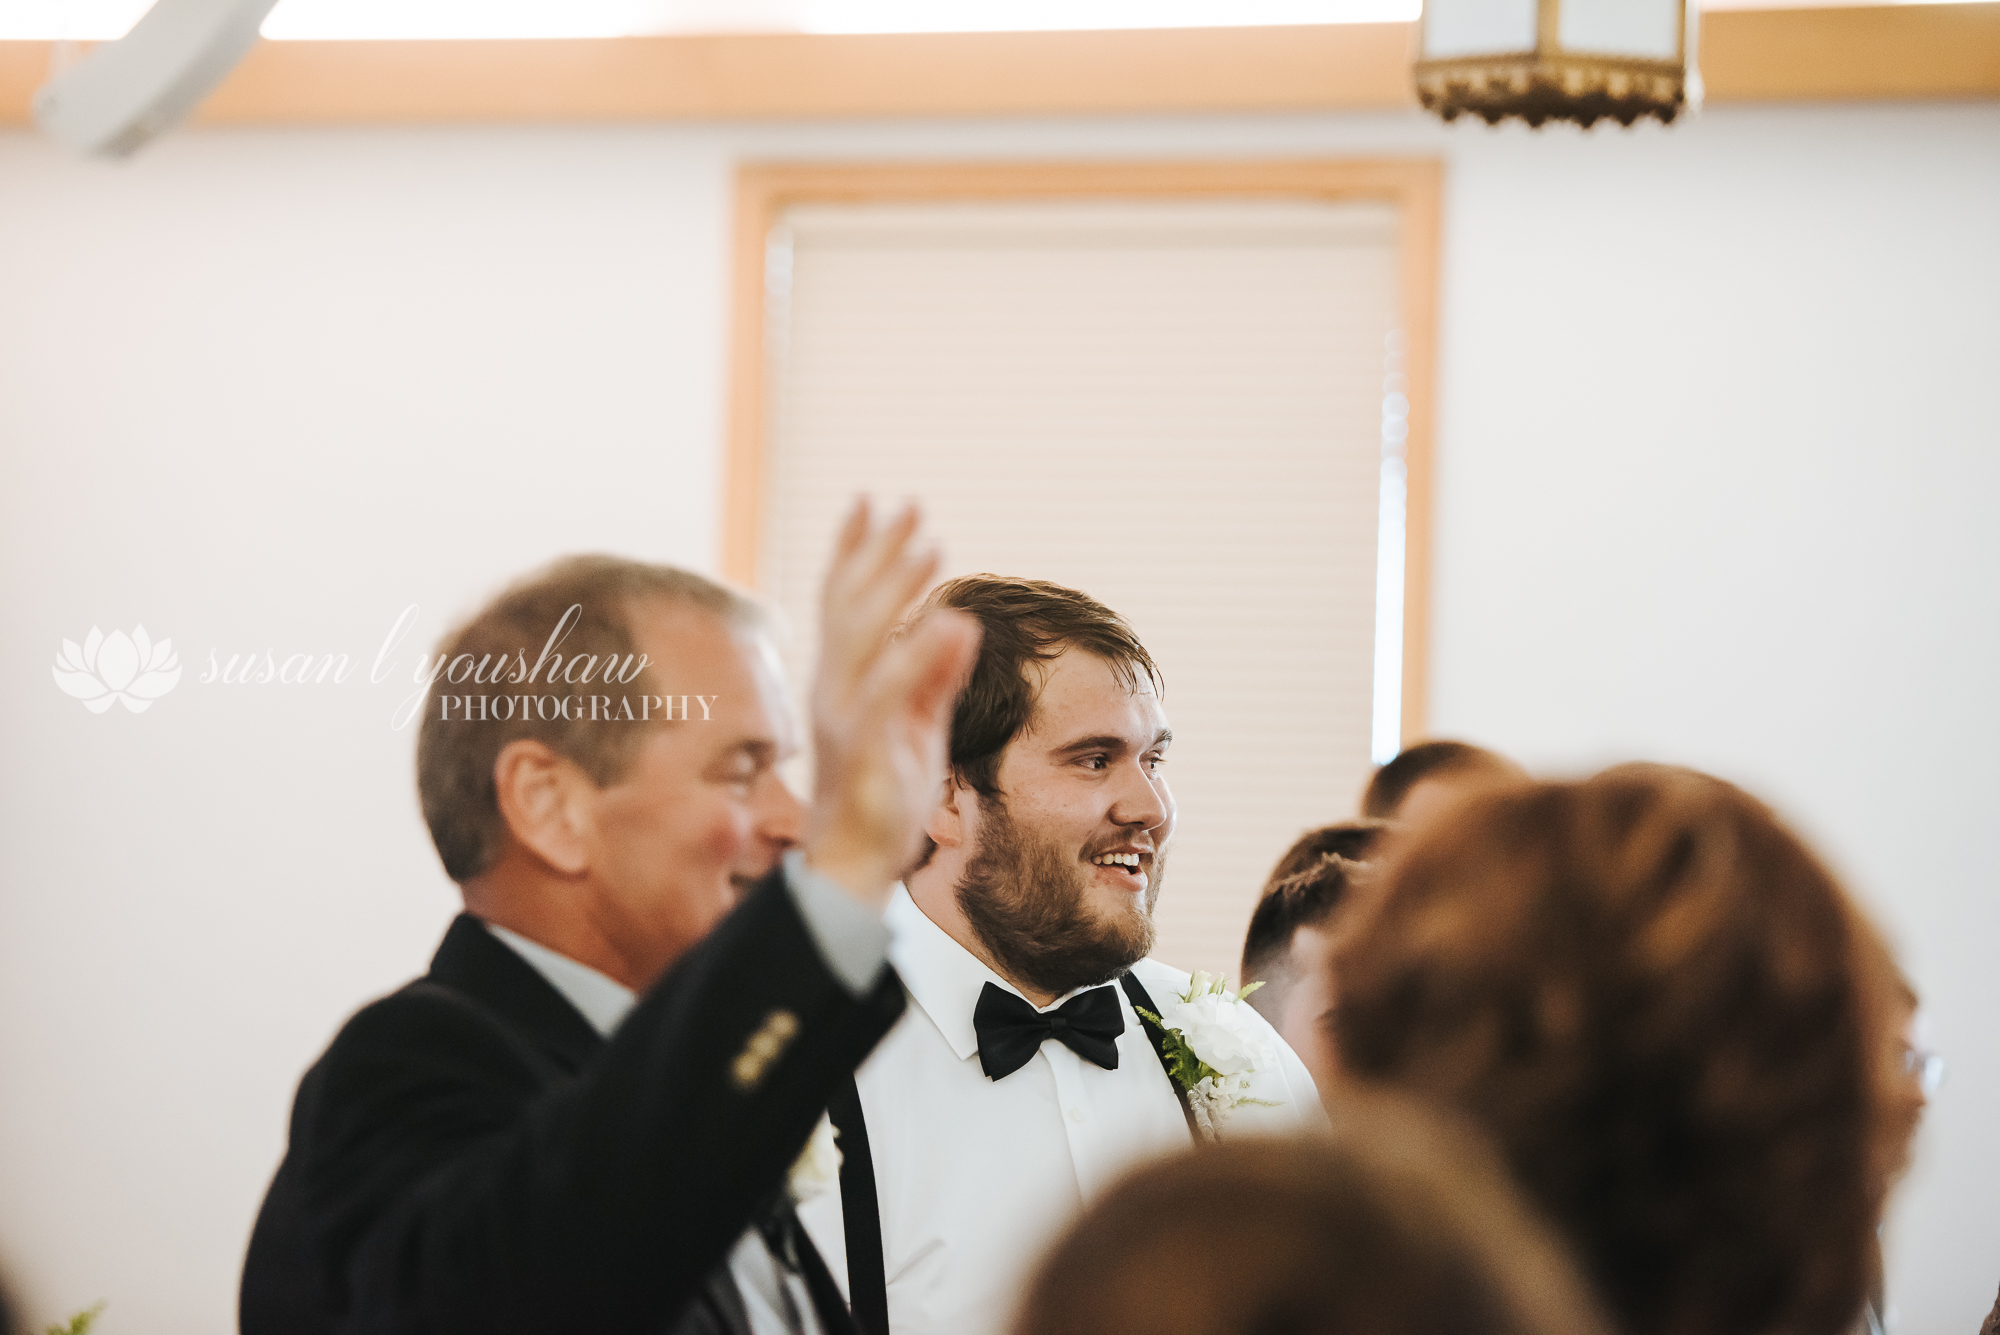 Katelyn and Wes Wedding Photos 07-13-2019 SLY Photography-58.jpg